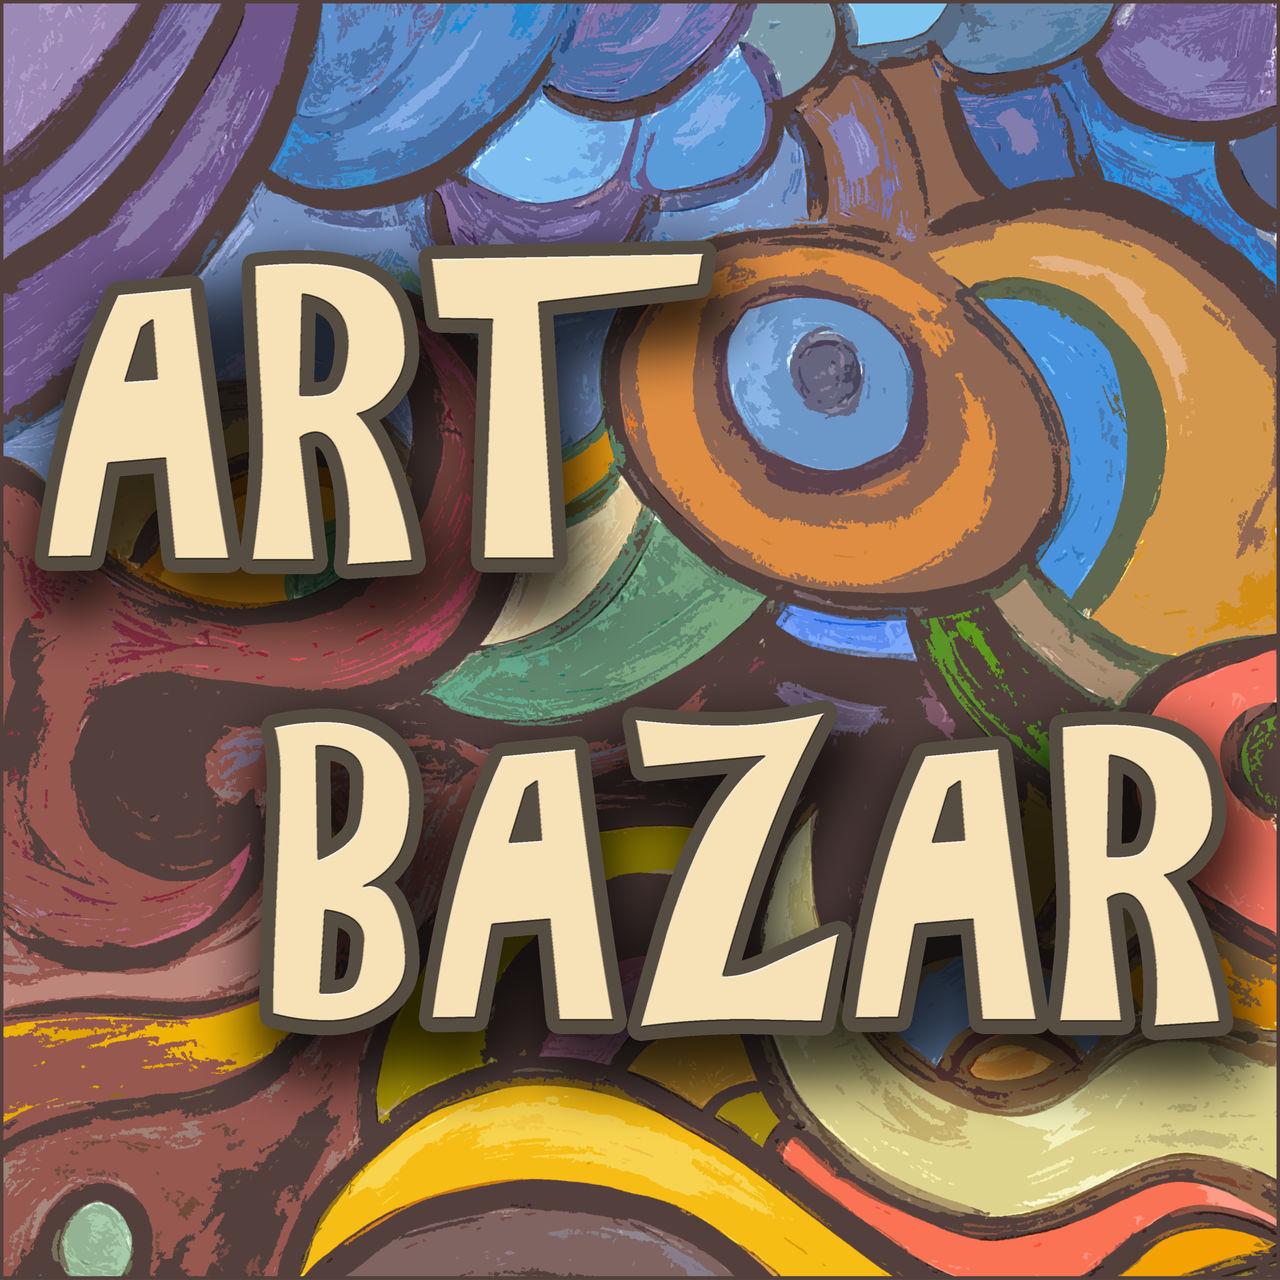 FIASCO Visuel Art Bazar